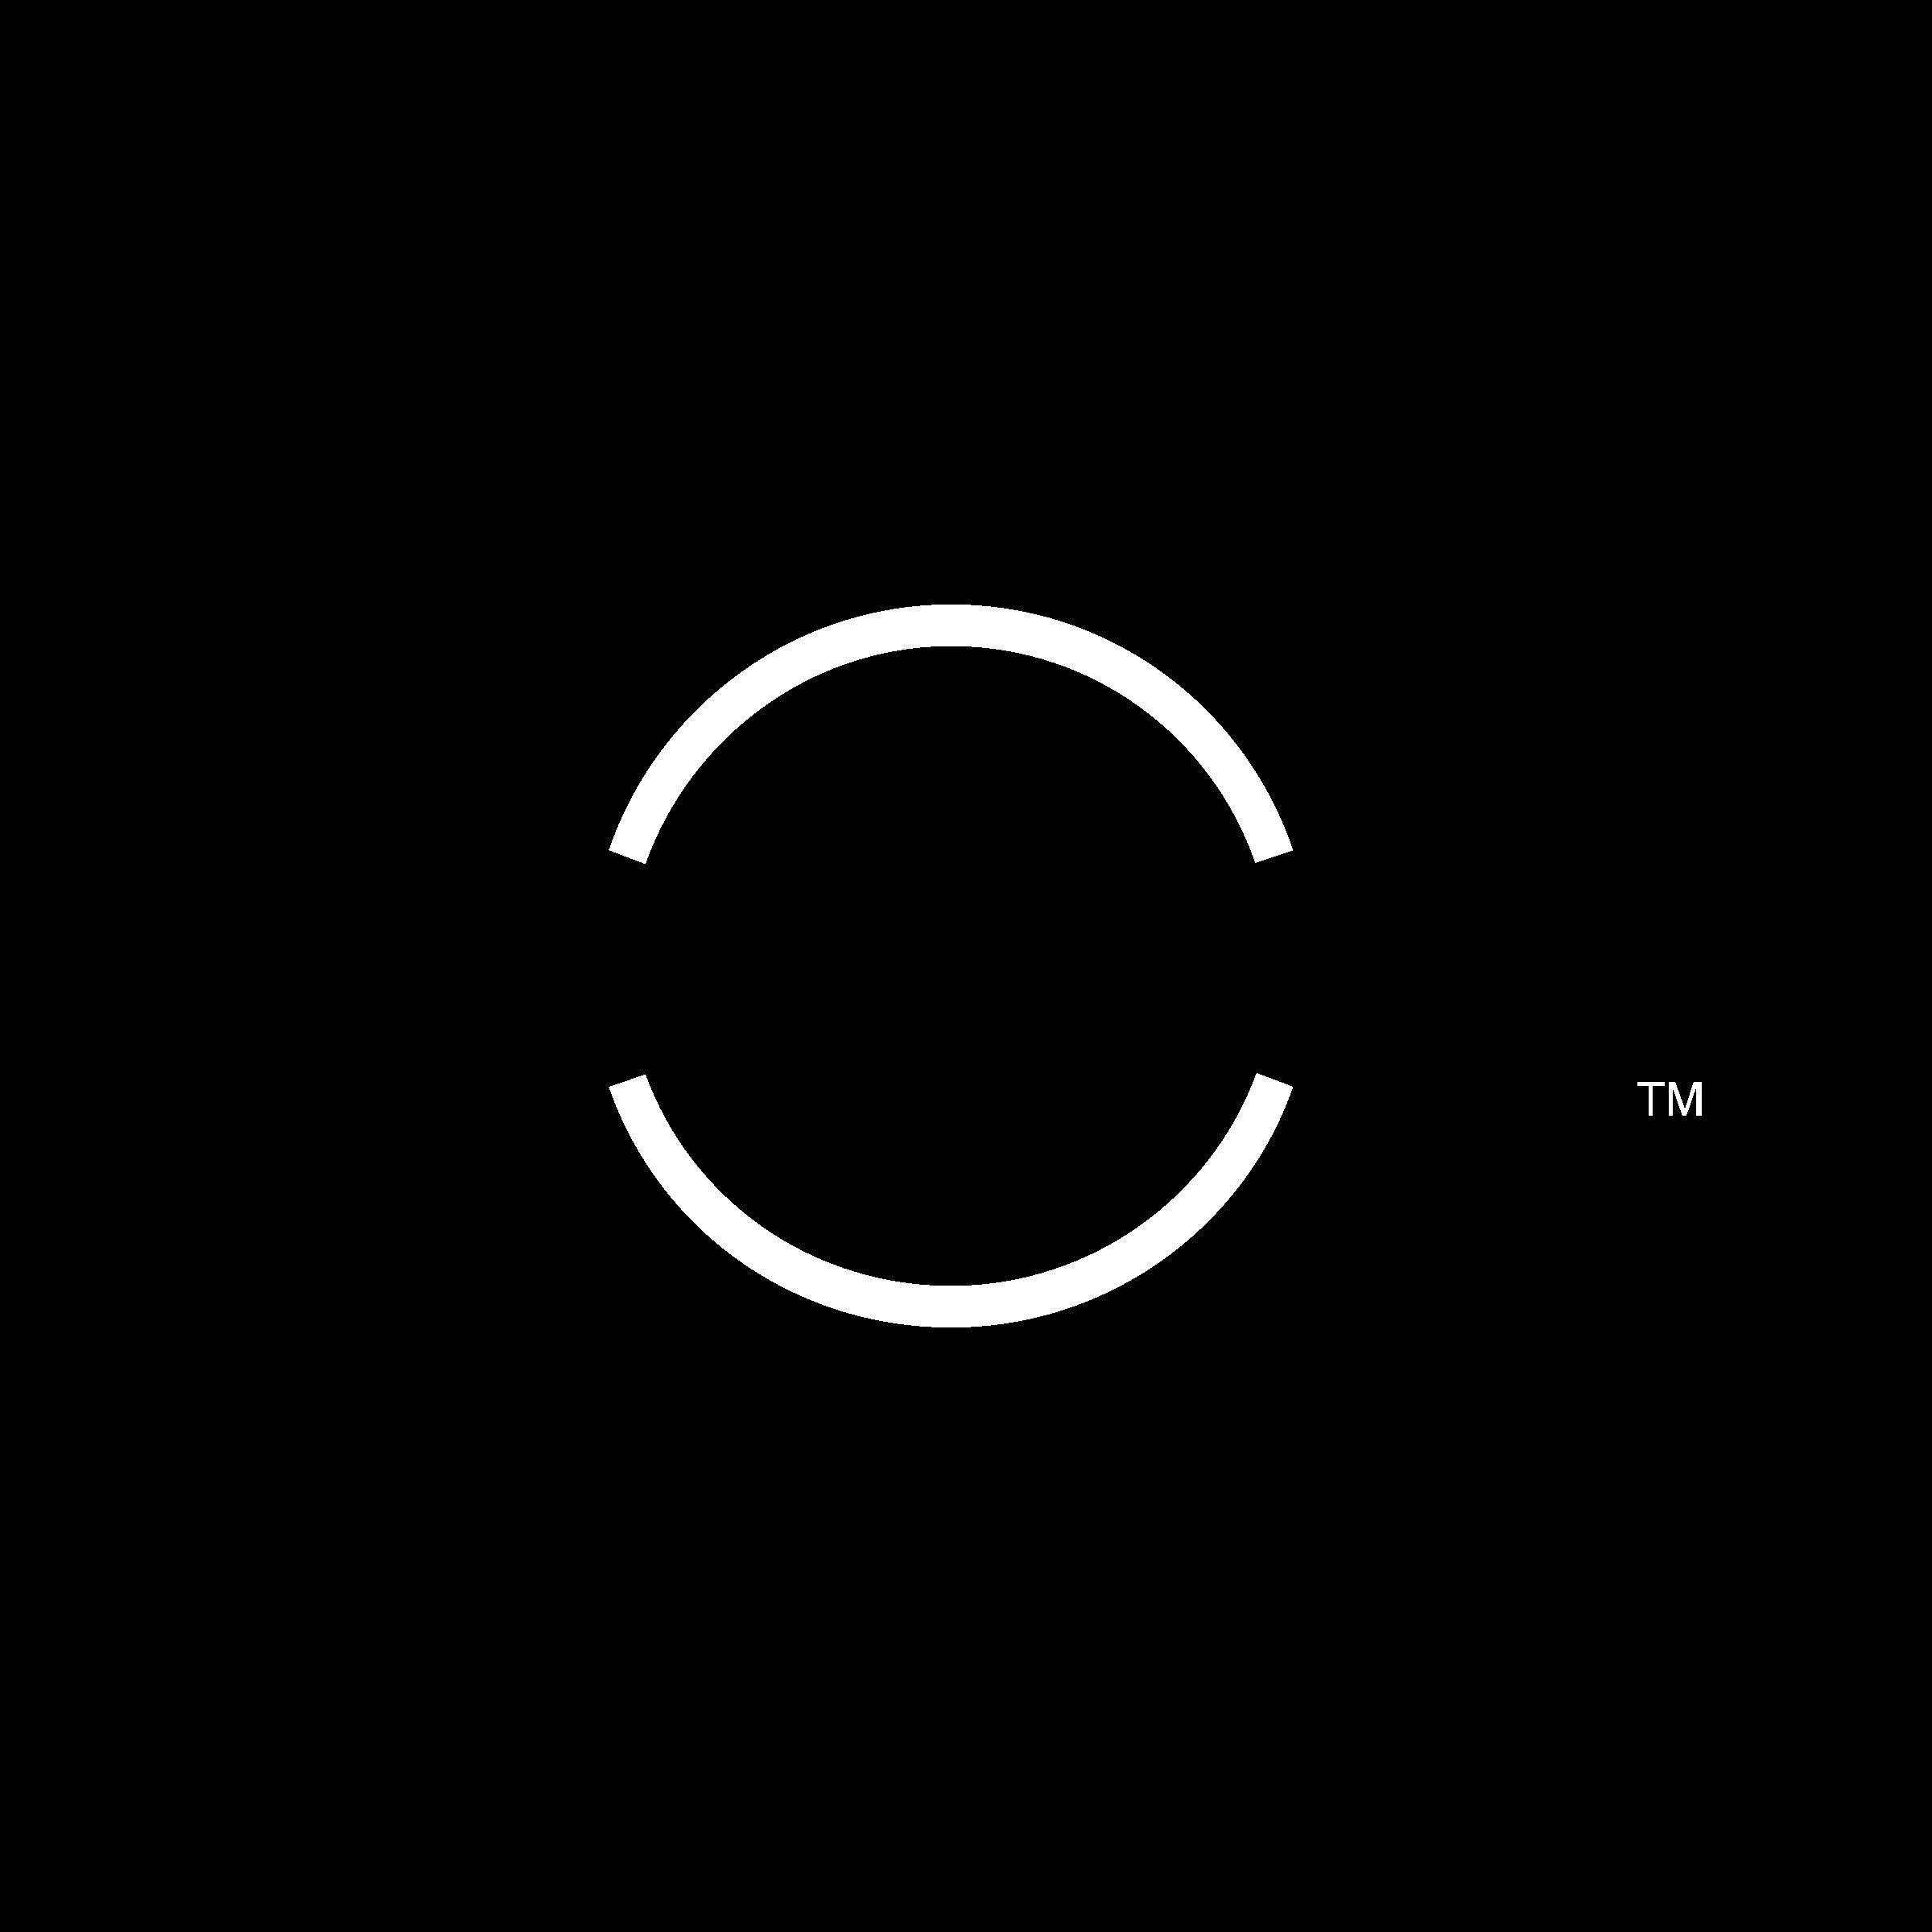 Lonely Planet Logo PNG Transparent & SVG Vector.